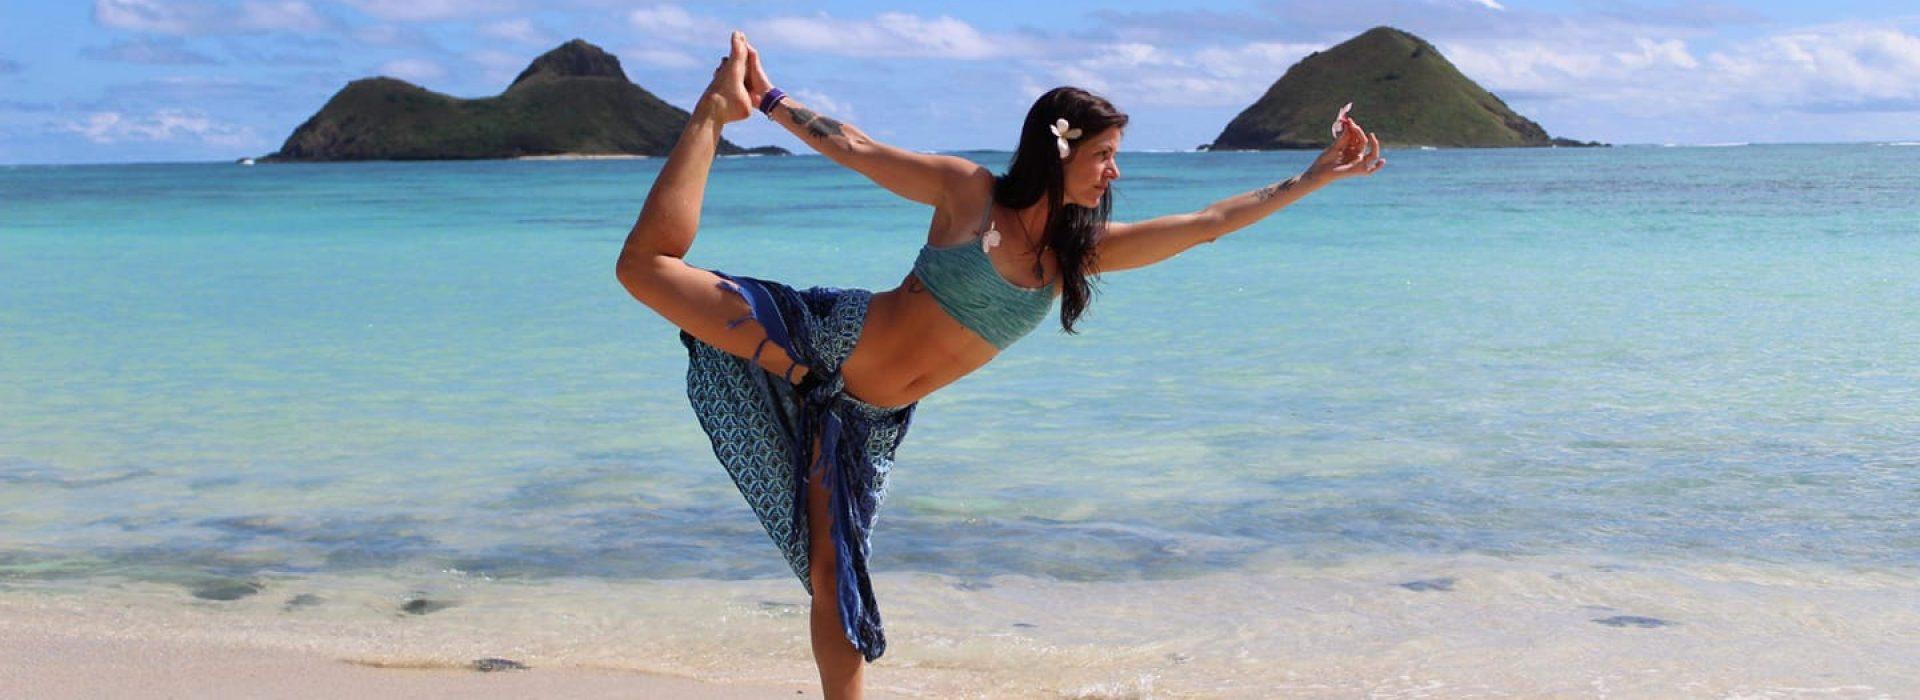 Aloha und Namasté